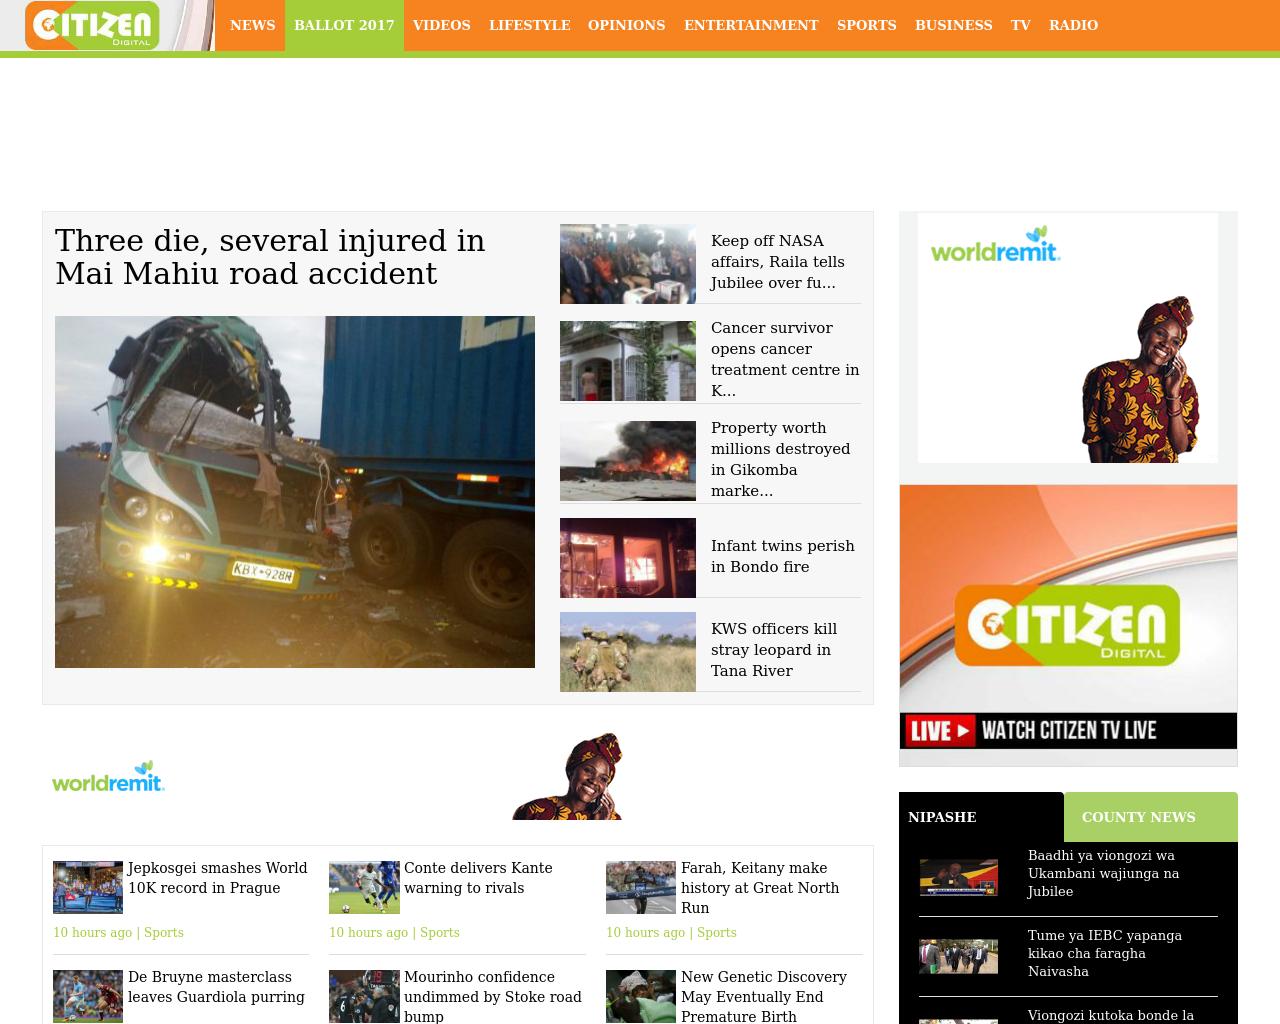 Citizen-Digital-Advertising-Reviews-Pricing